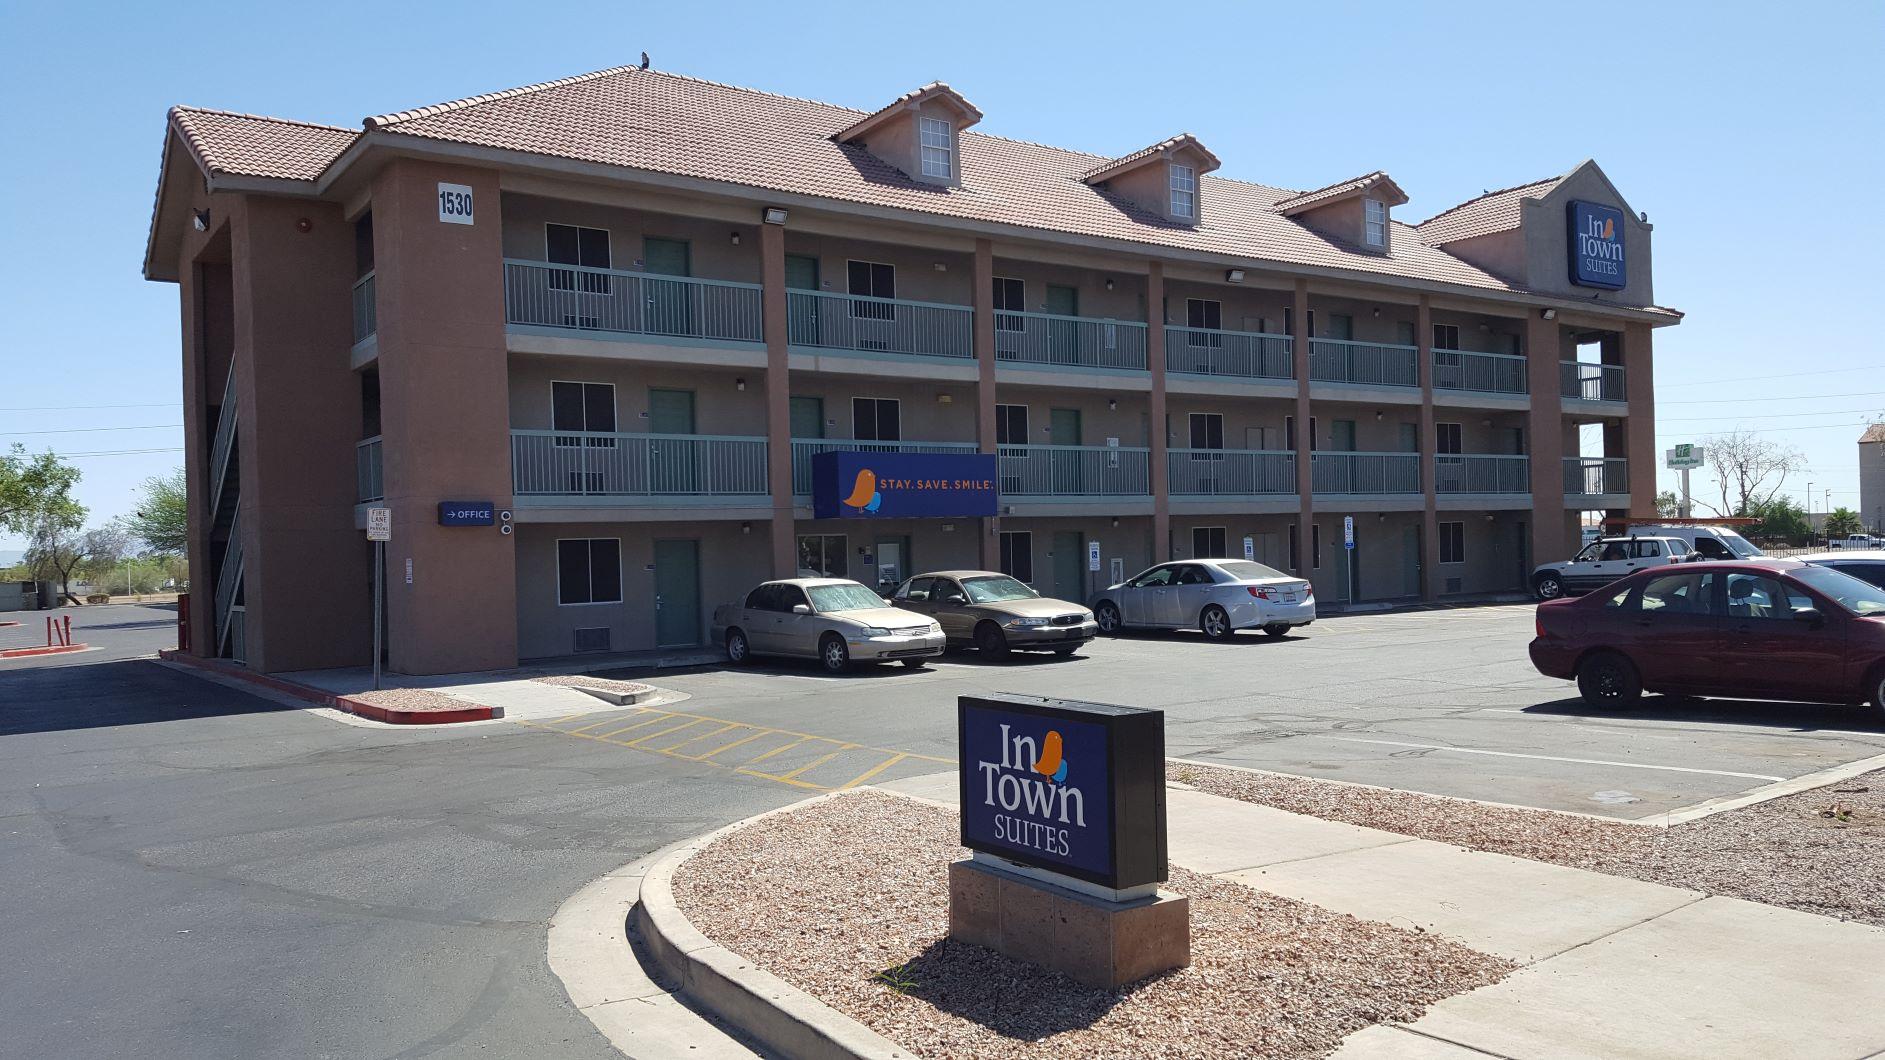 InTown Suites Extended Stay Phoenix AZ - East